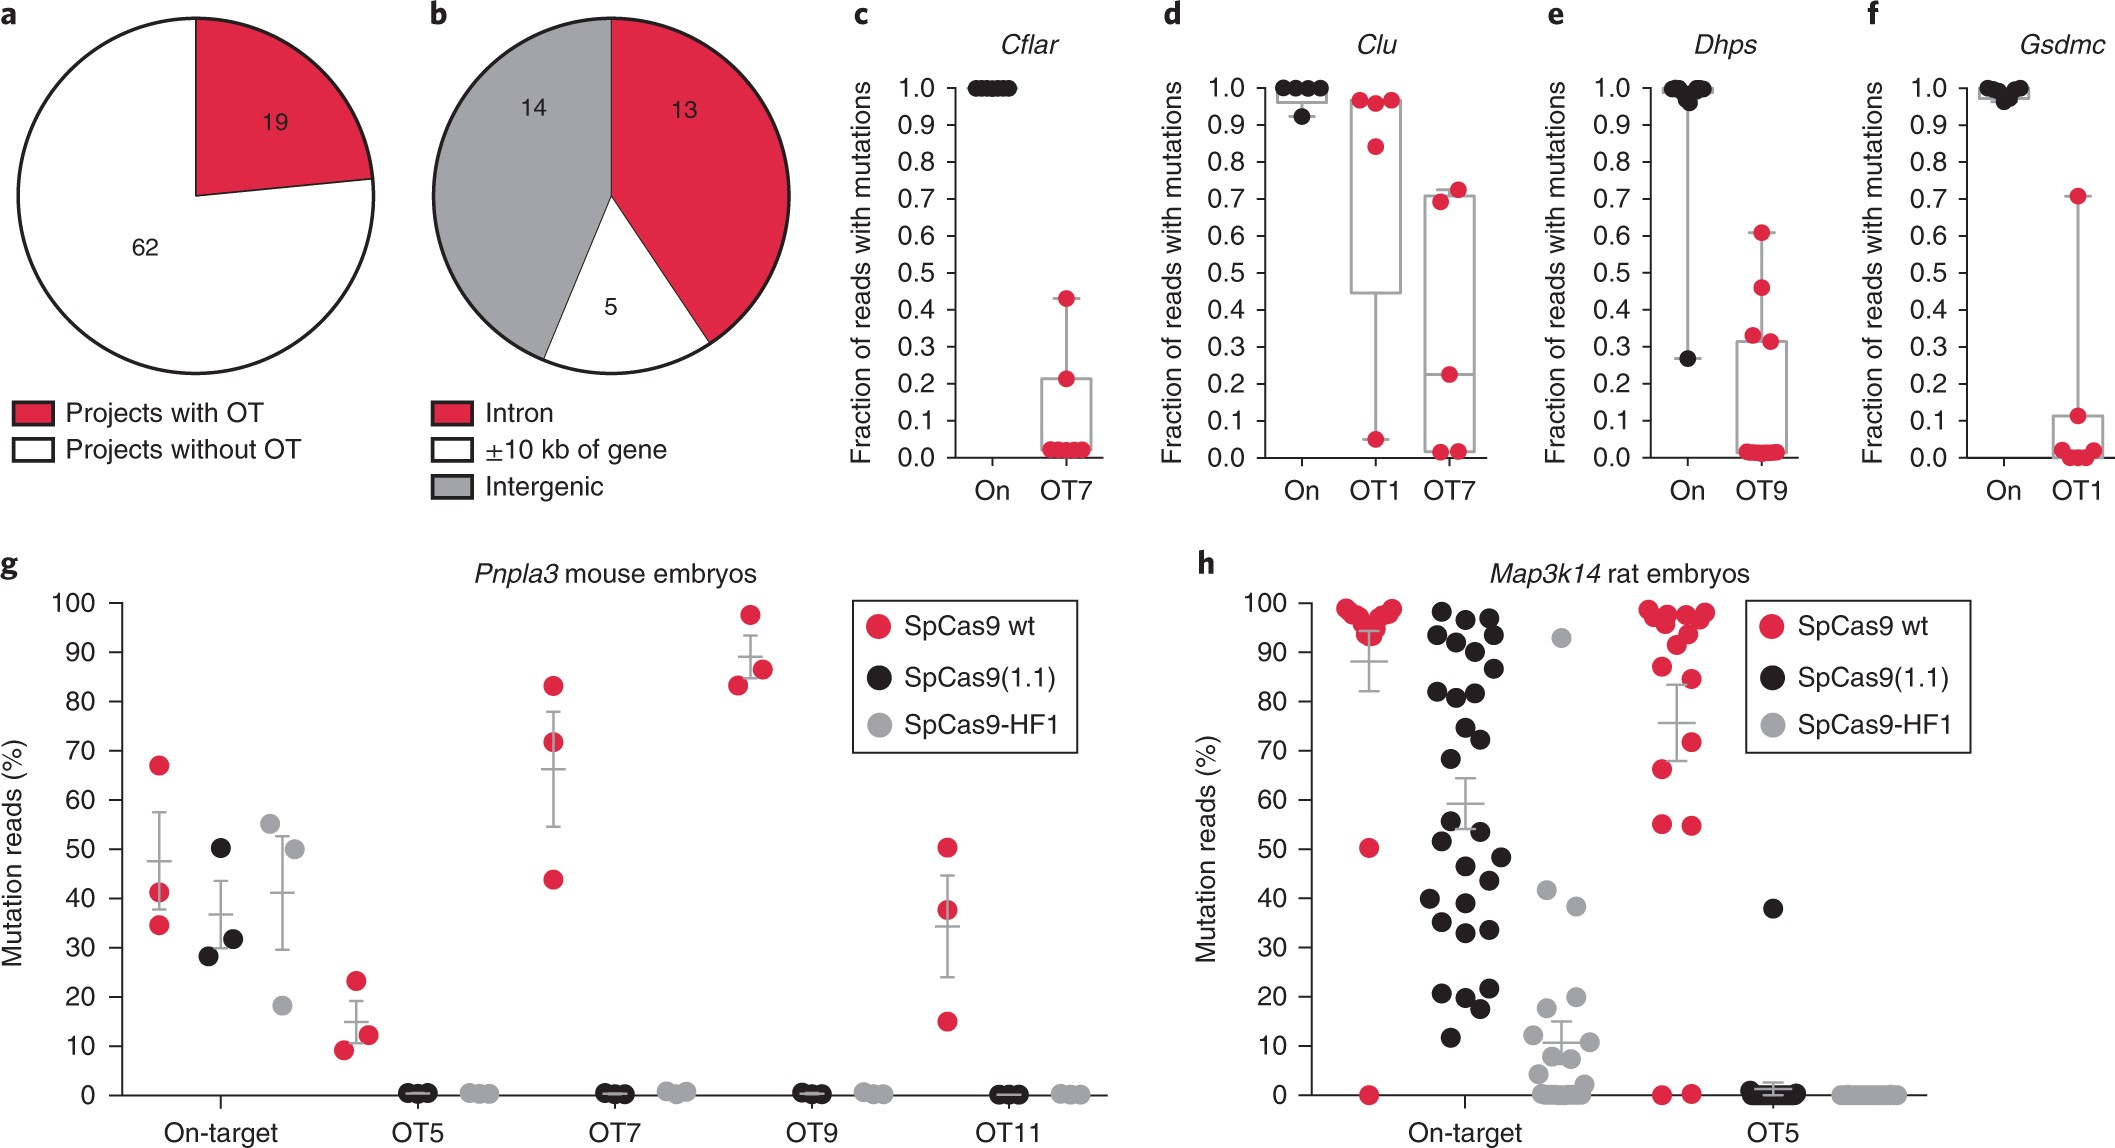 CRISPR off-target analysis in genetically engineered rats